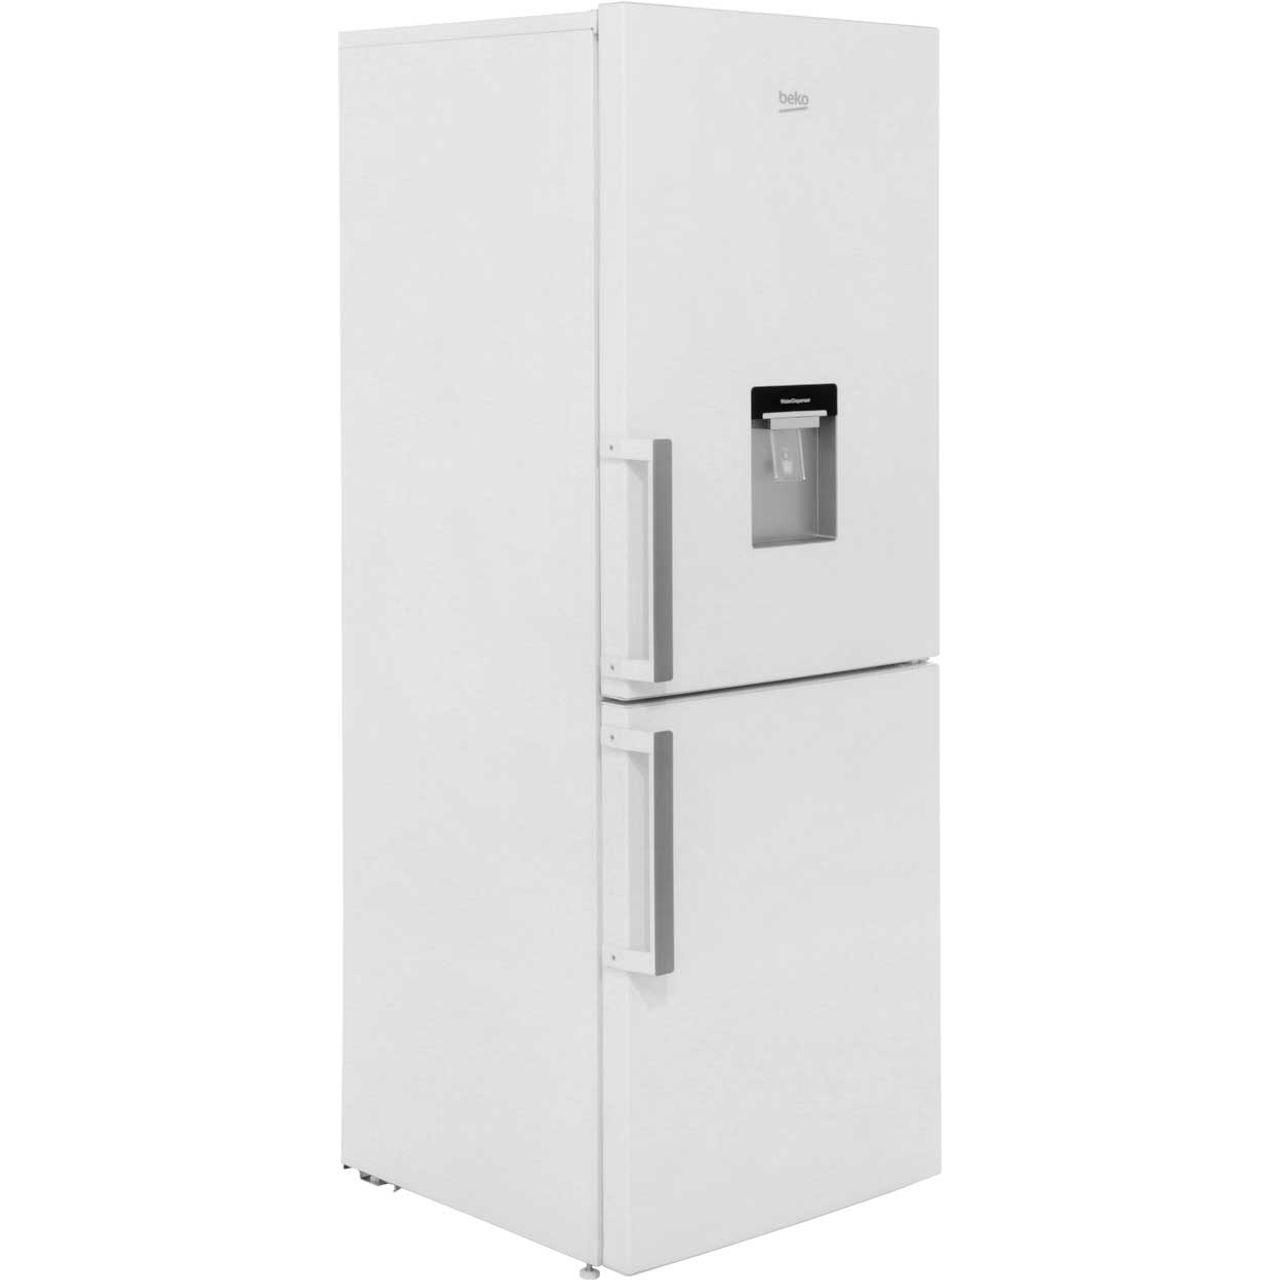 beko cfp1675dw 60 40 frost free fridge freezer white. Black Bedroom Furniture Sets. Home Design Ideas